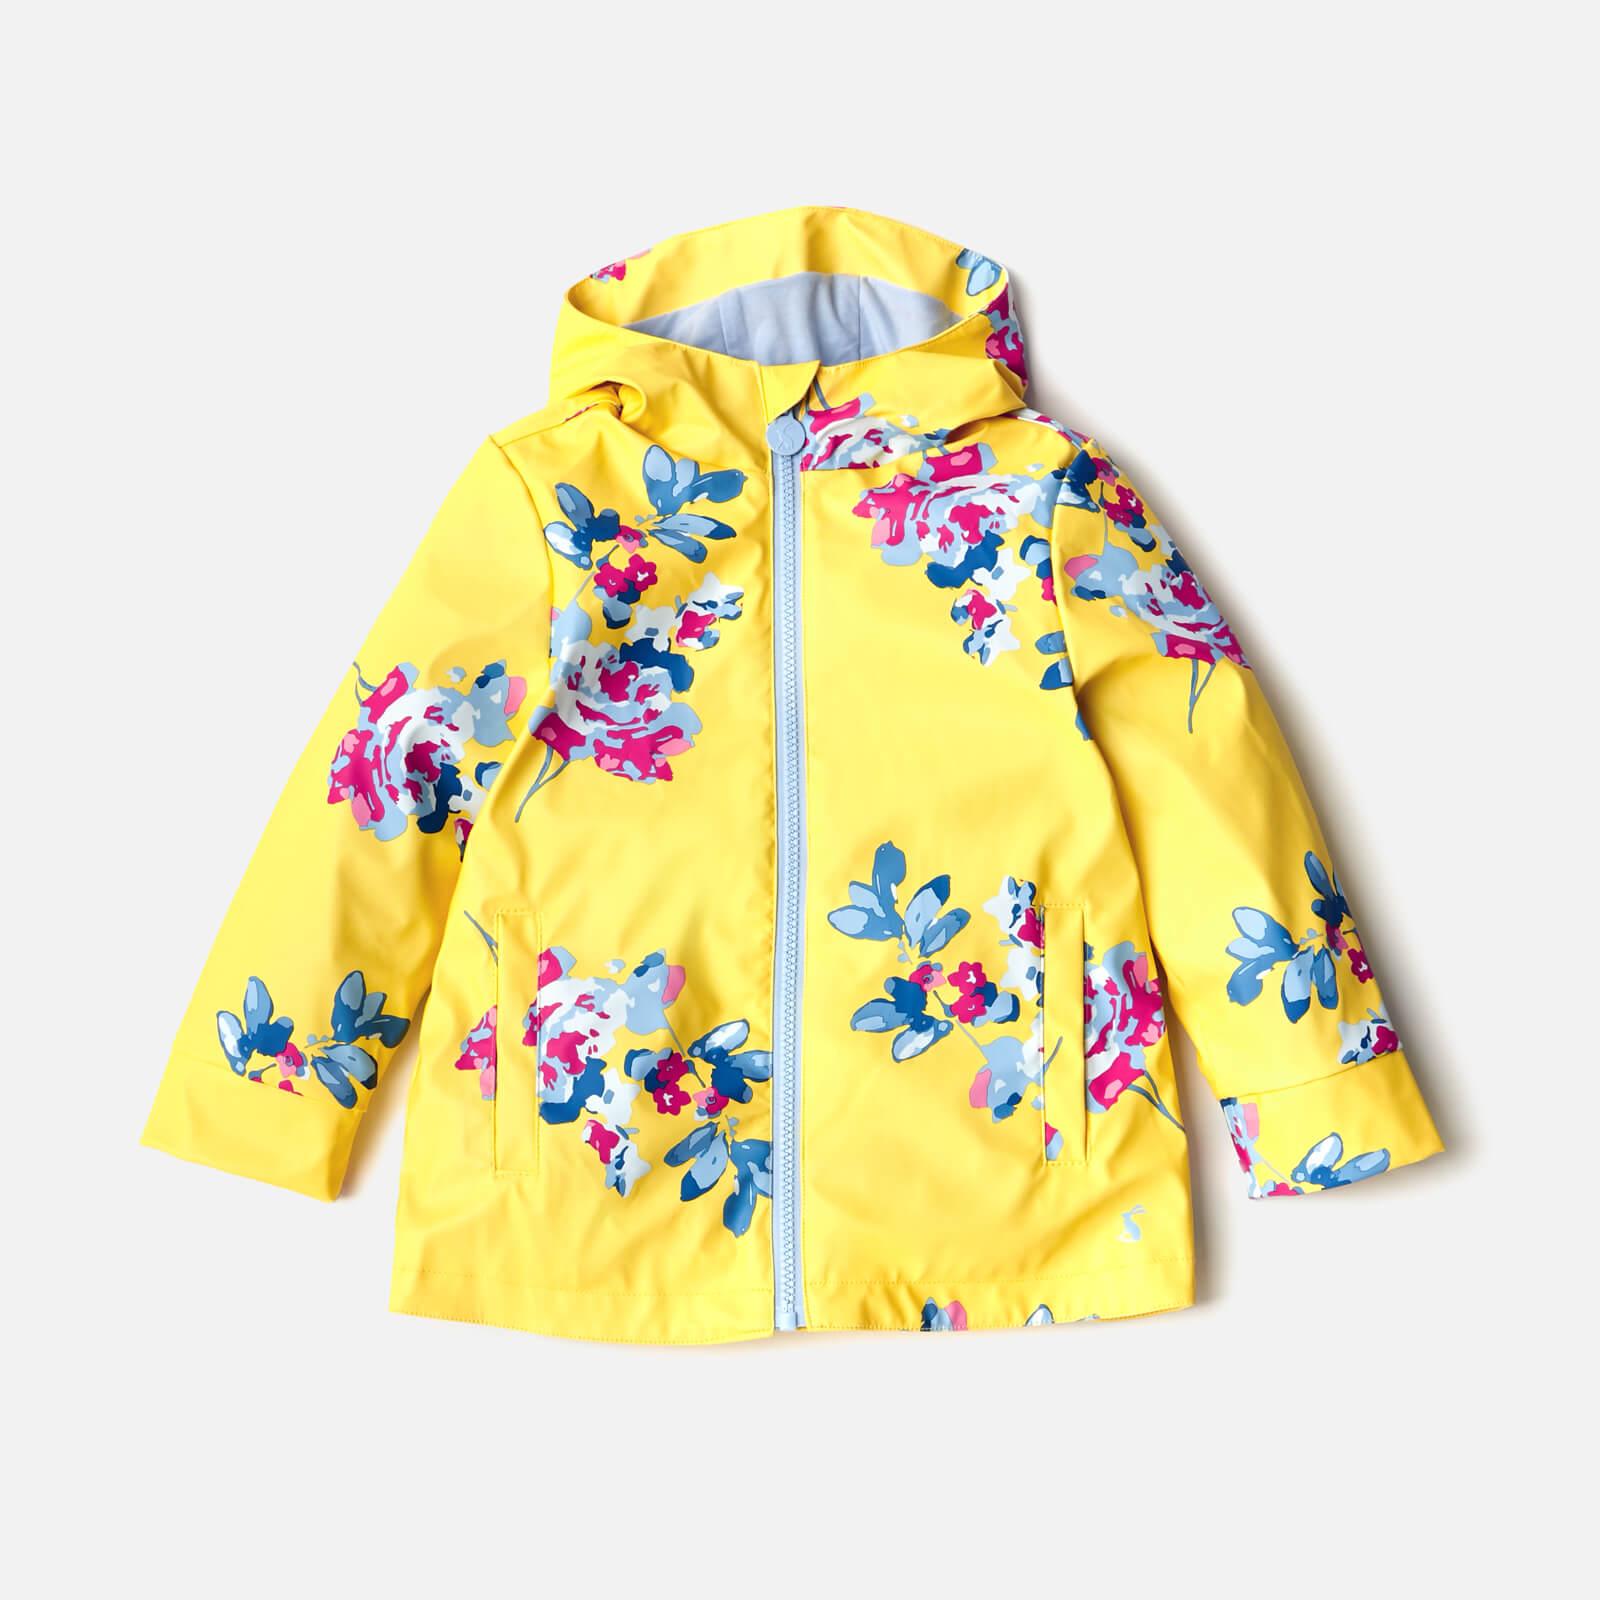 b965f01de Joules Girls' Raindance Waterproof Coat - Yellow Margate Floral Clothing |  TheHut.com